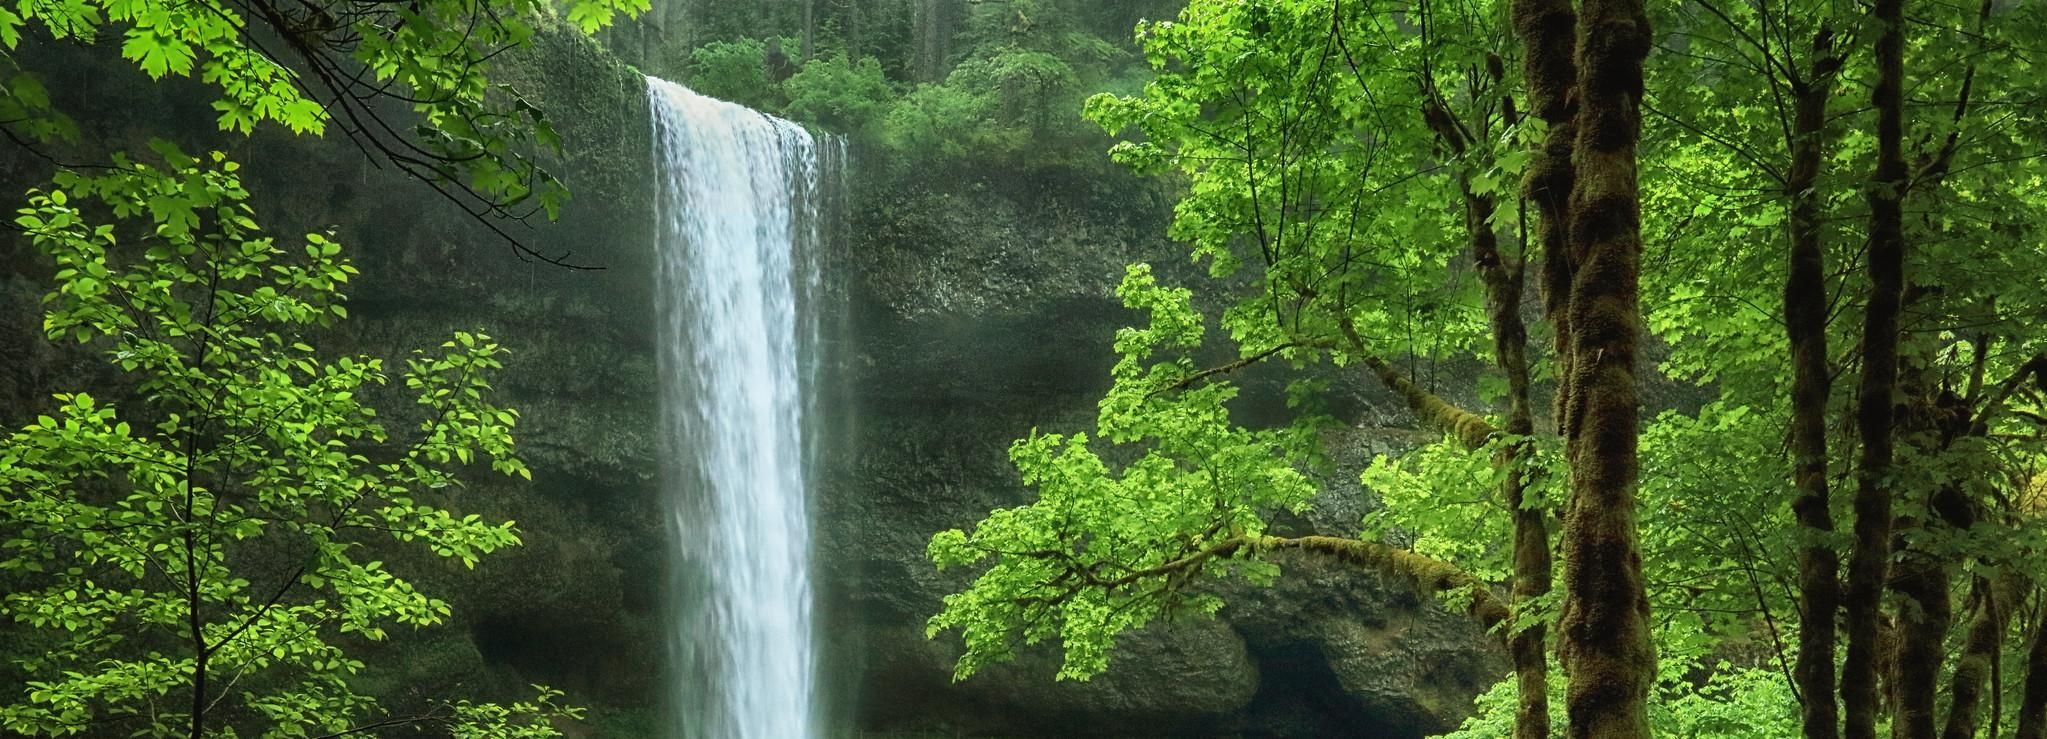 Portland: All-Inclusive Willamette Valley Waterfalls & Wine